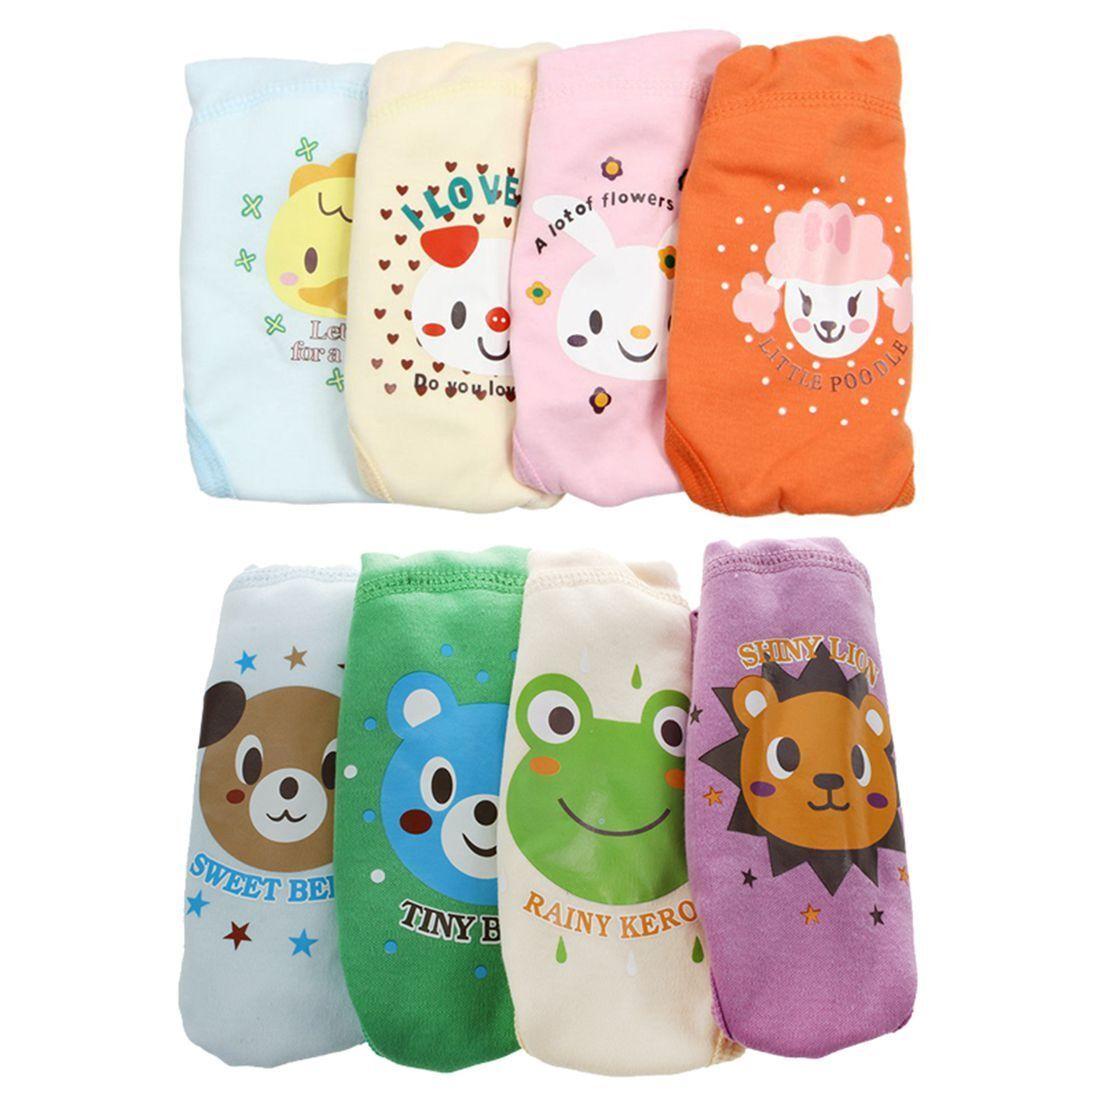 4x Baby Toddler Girls Boy Cute 4 Layers Waterproof Potty Training Pants Random. 5